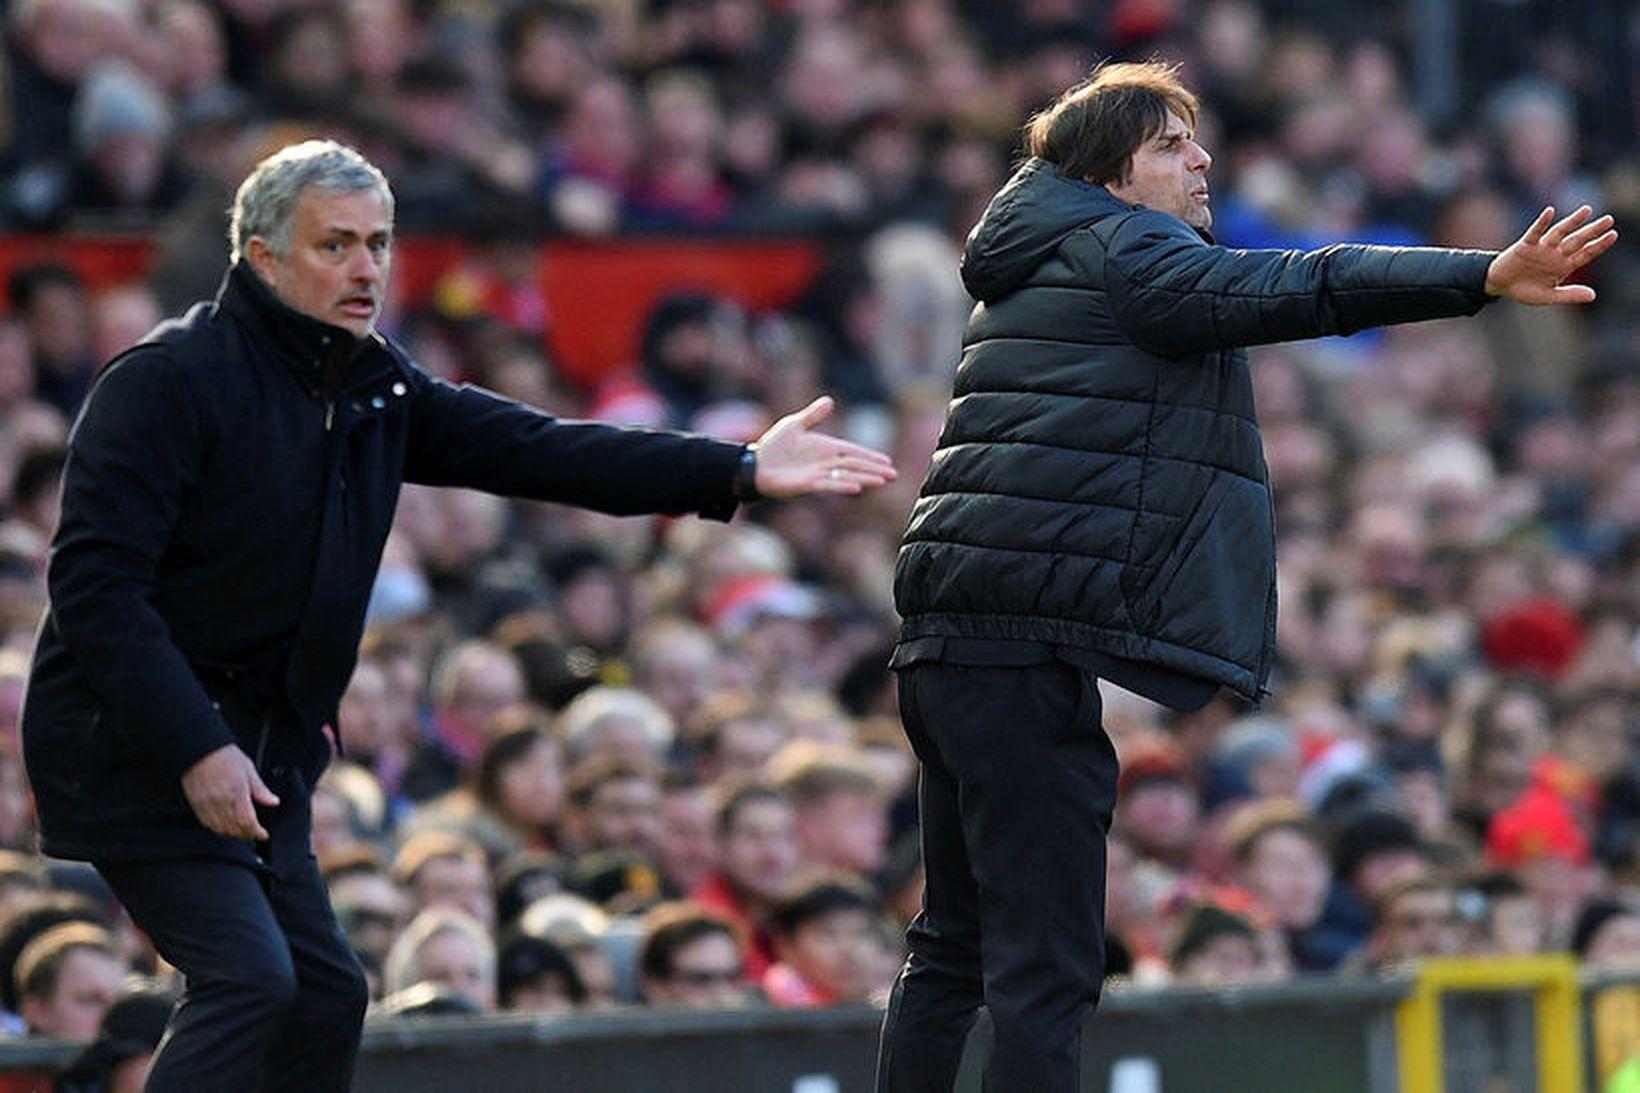 José Mourinho og Antonio Conte munu deila hliðarlínu á ný …